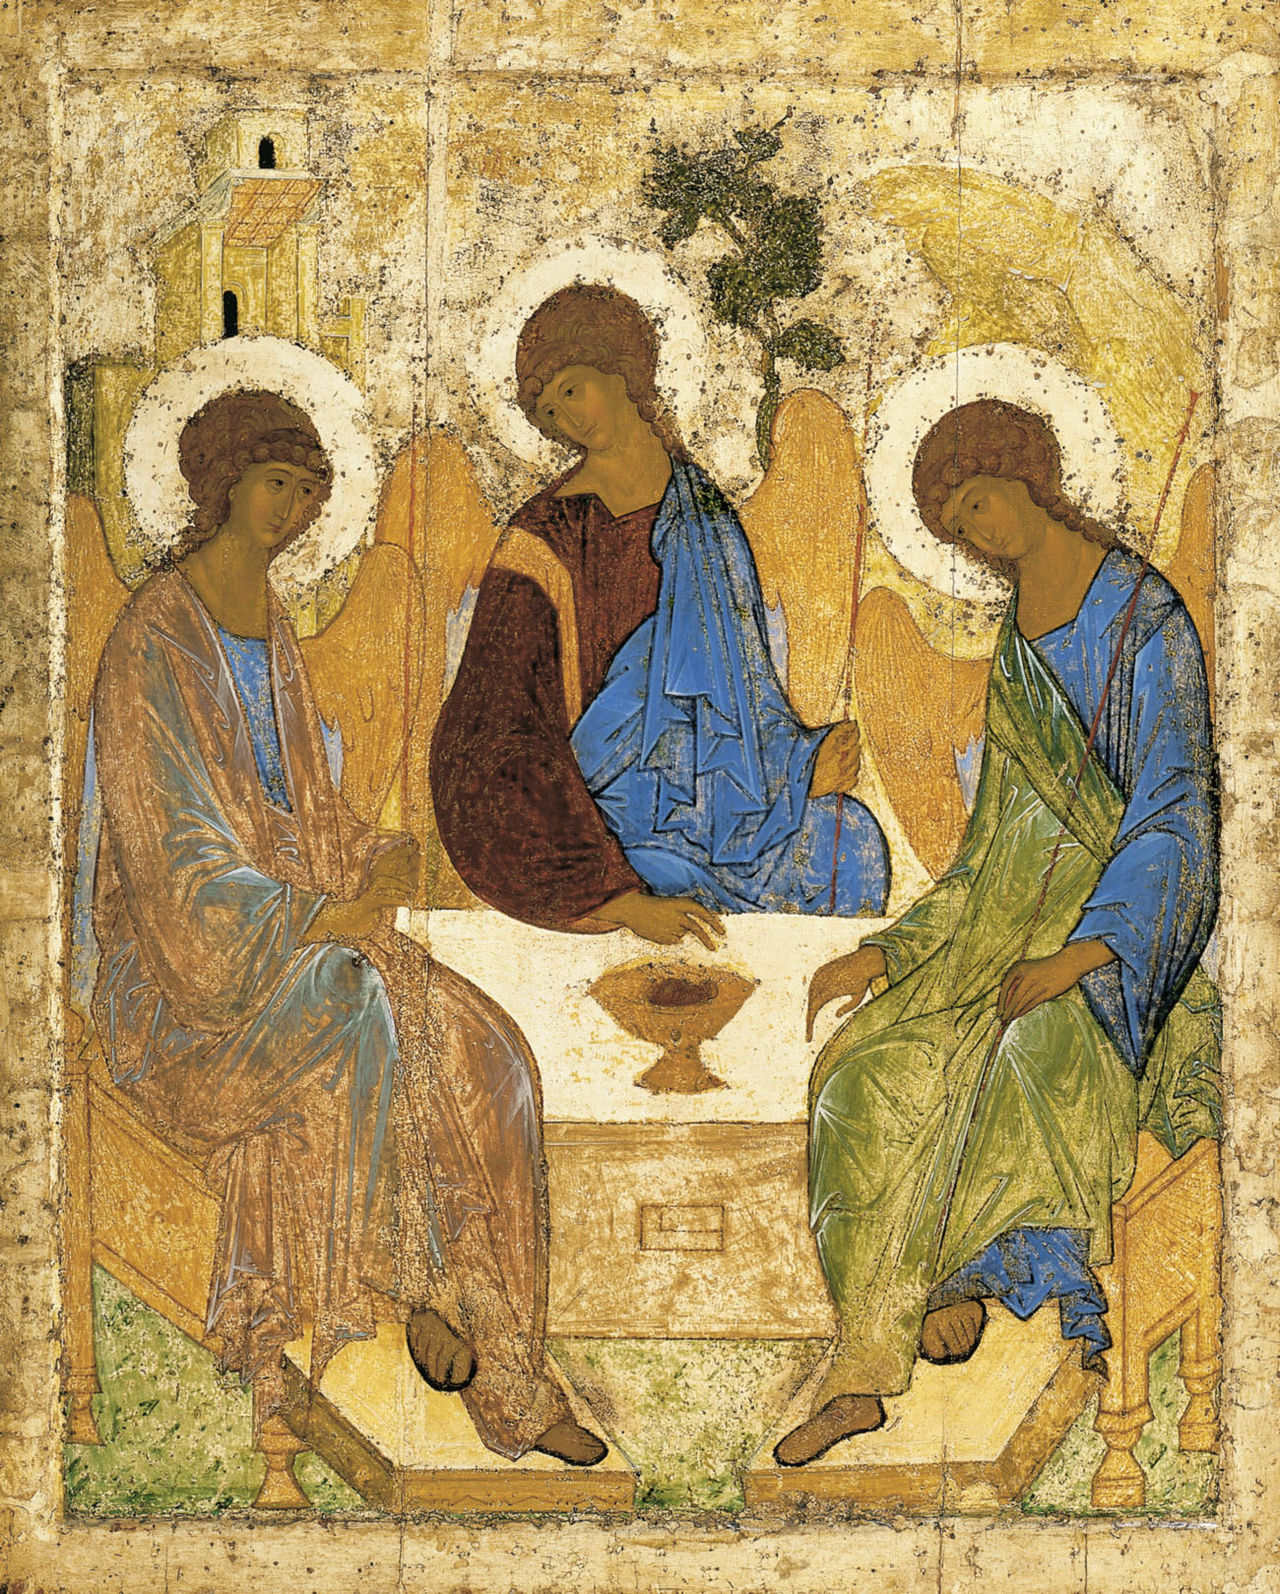 1280px-Angelsatmamre-trinity-rublev-1410